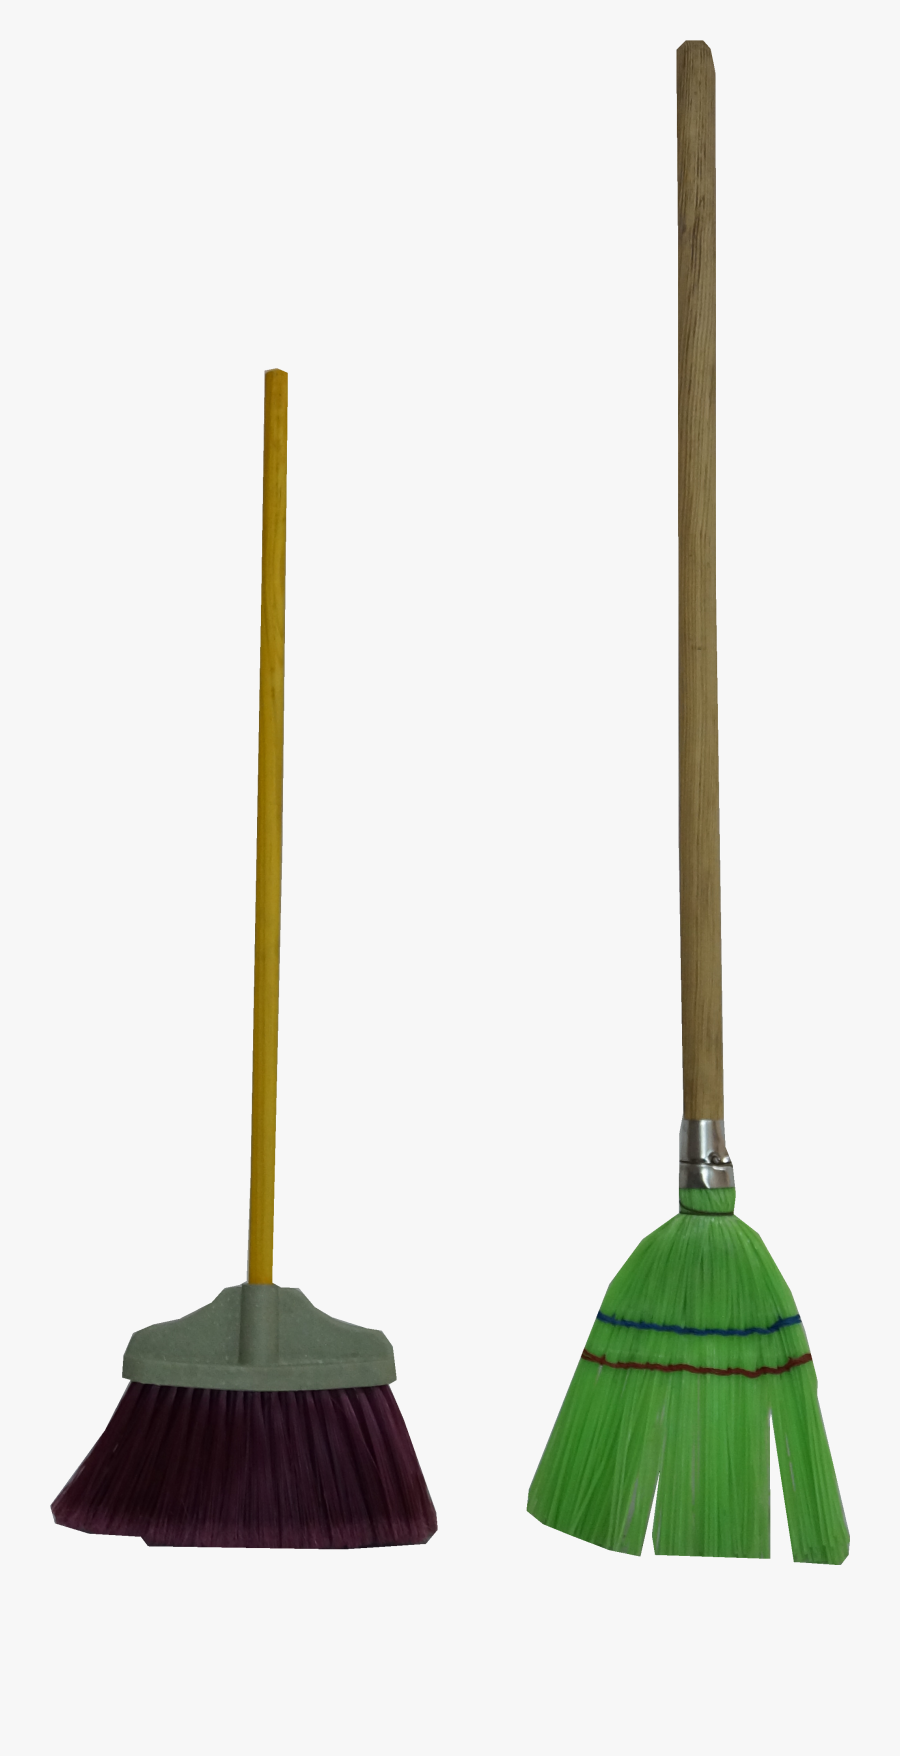 Lawn Mower - Floor, Transparent Clipart